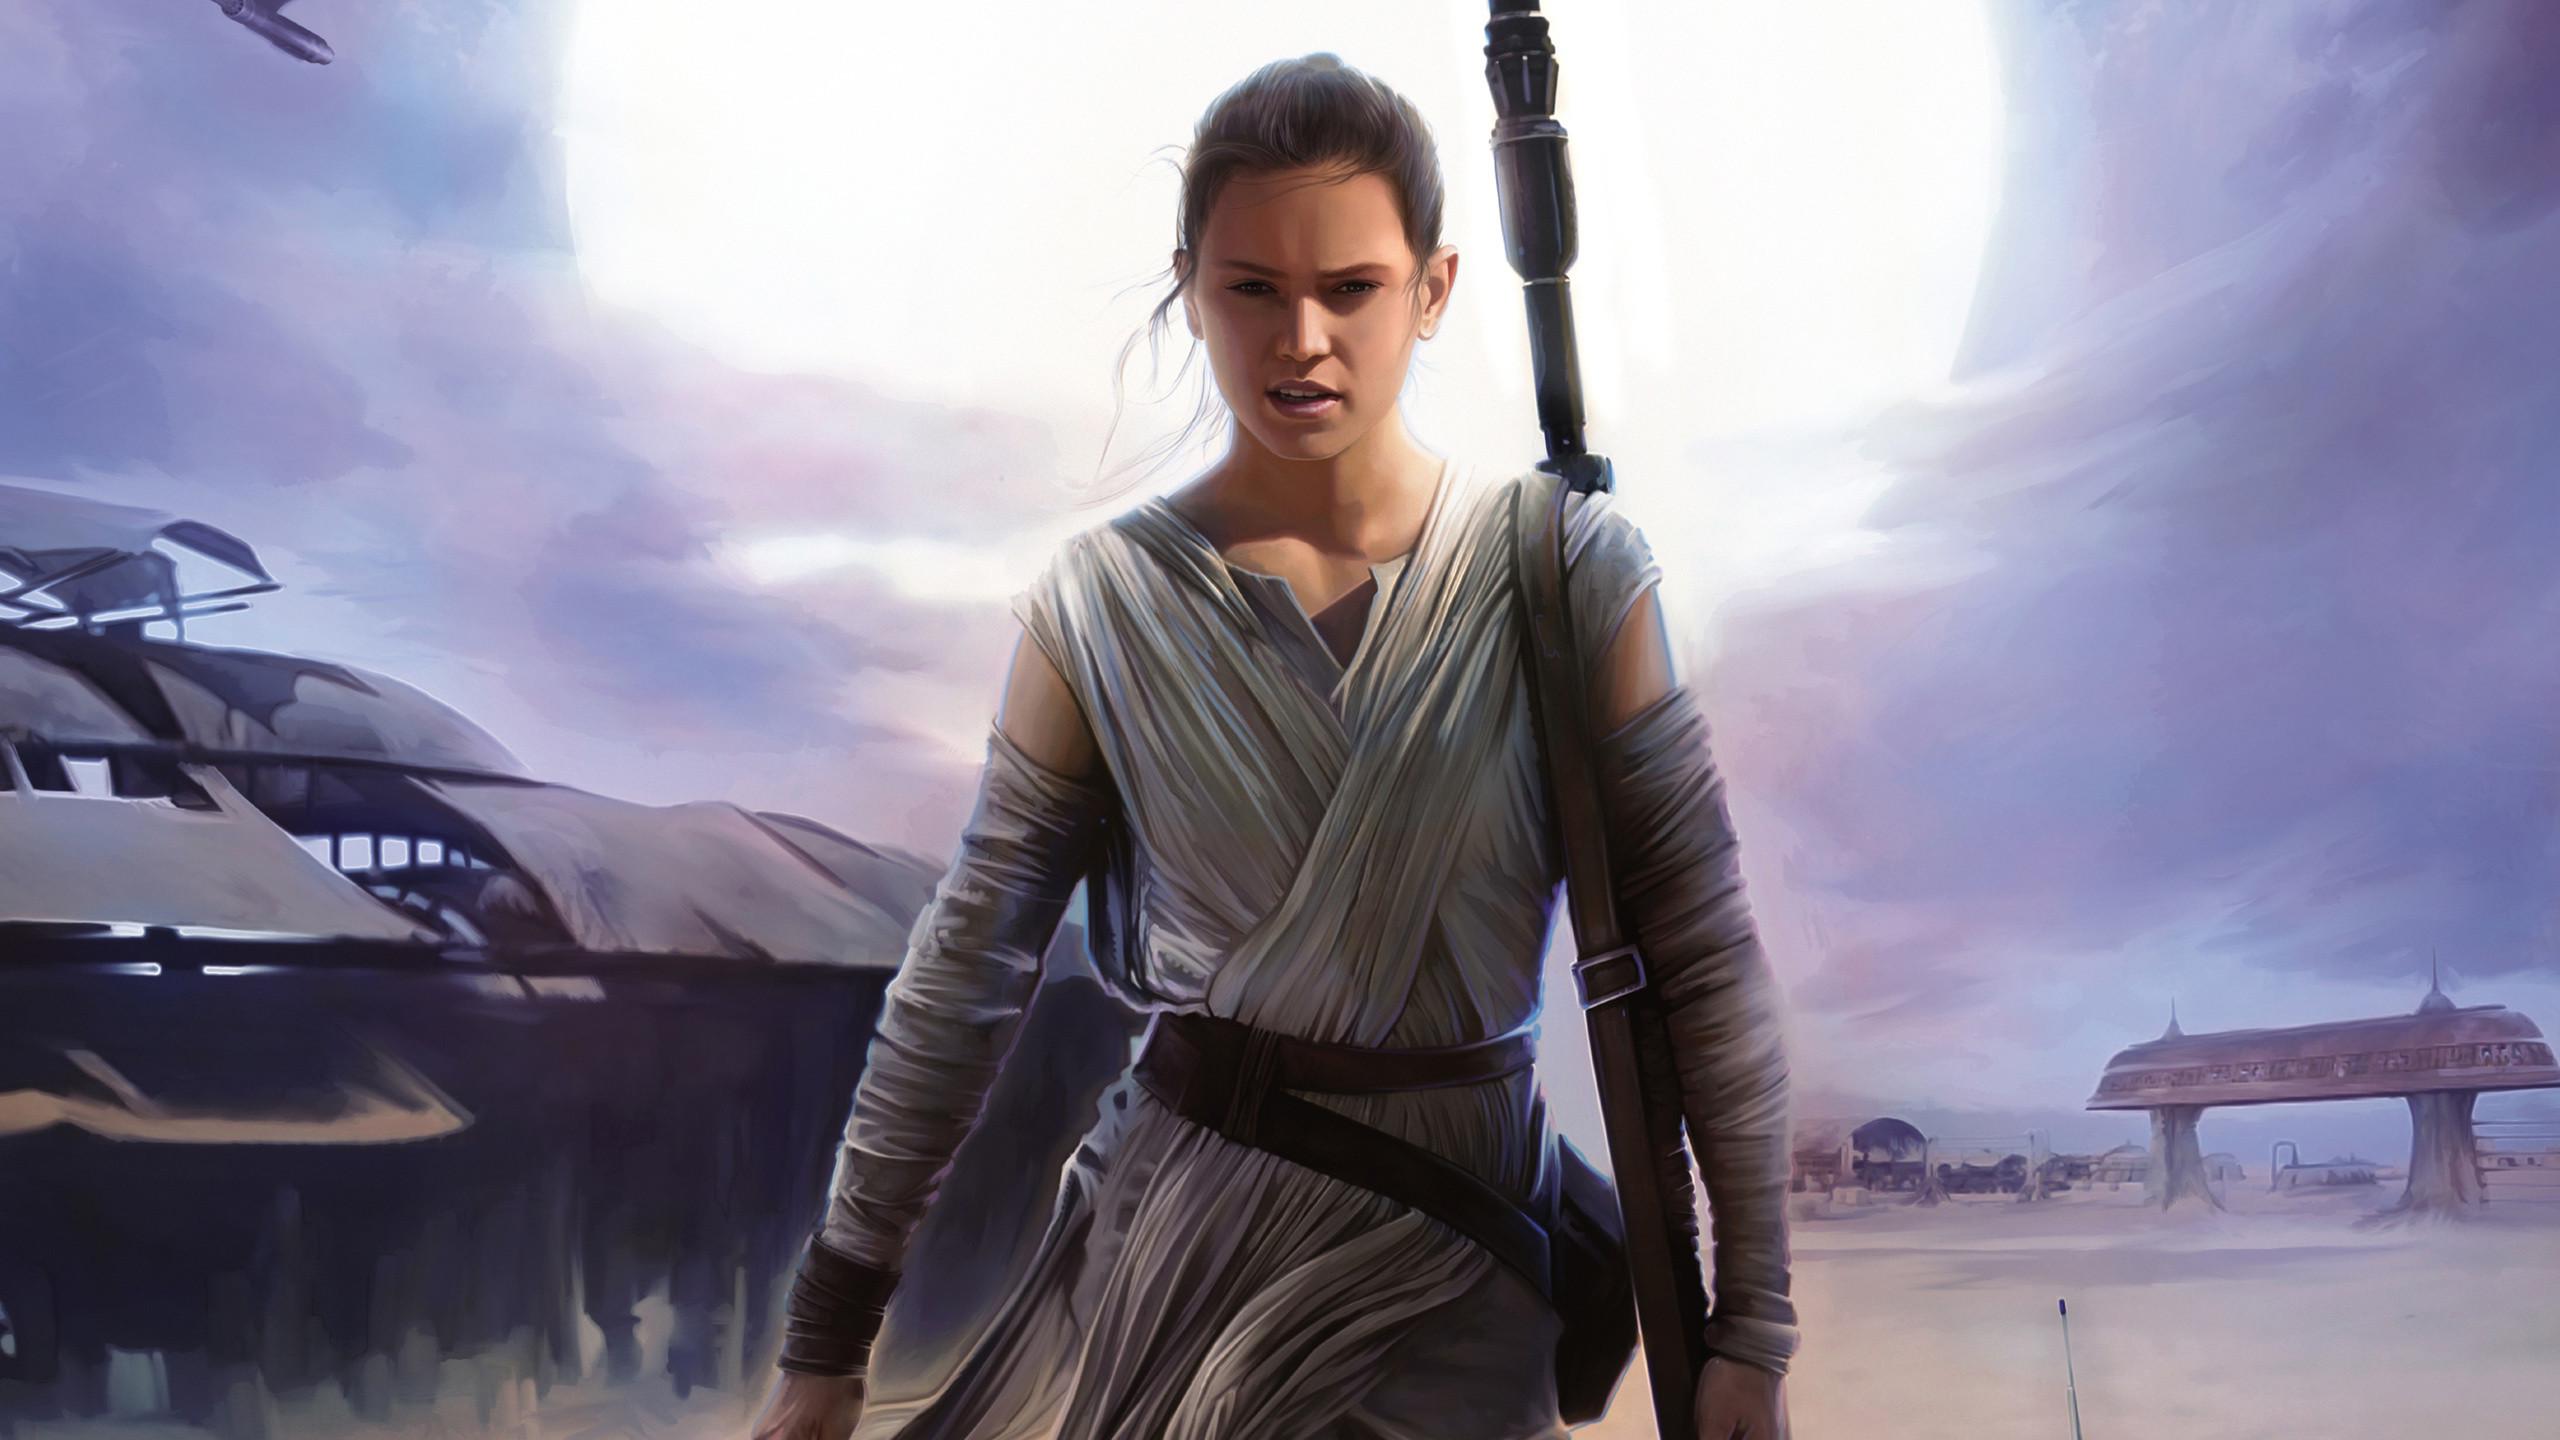 Rey Artwork – Star Wars 7: The Force Awakens wallpaper